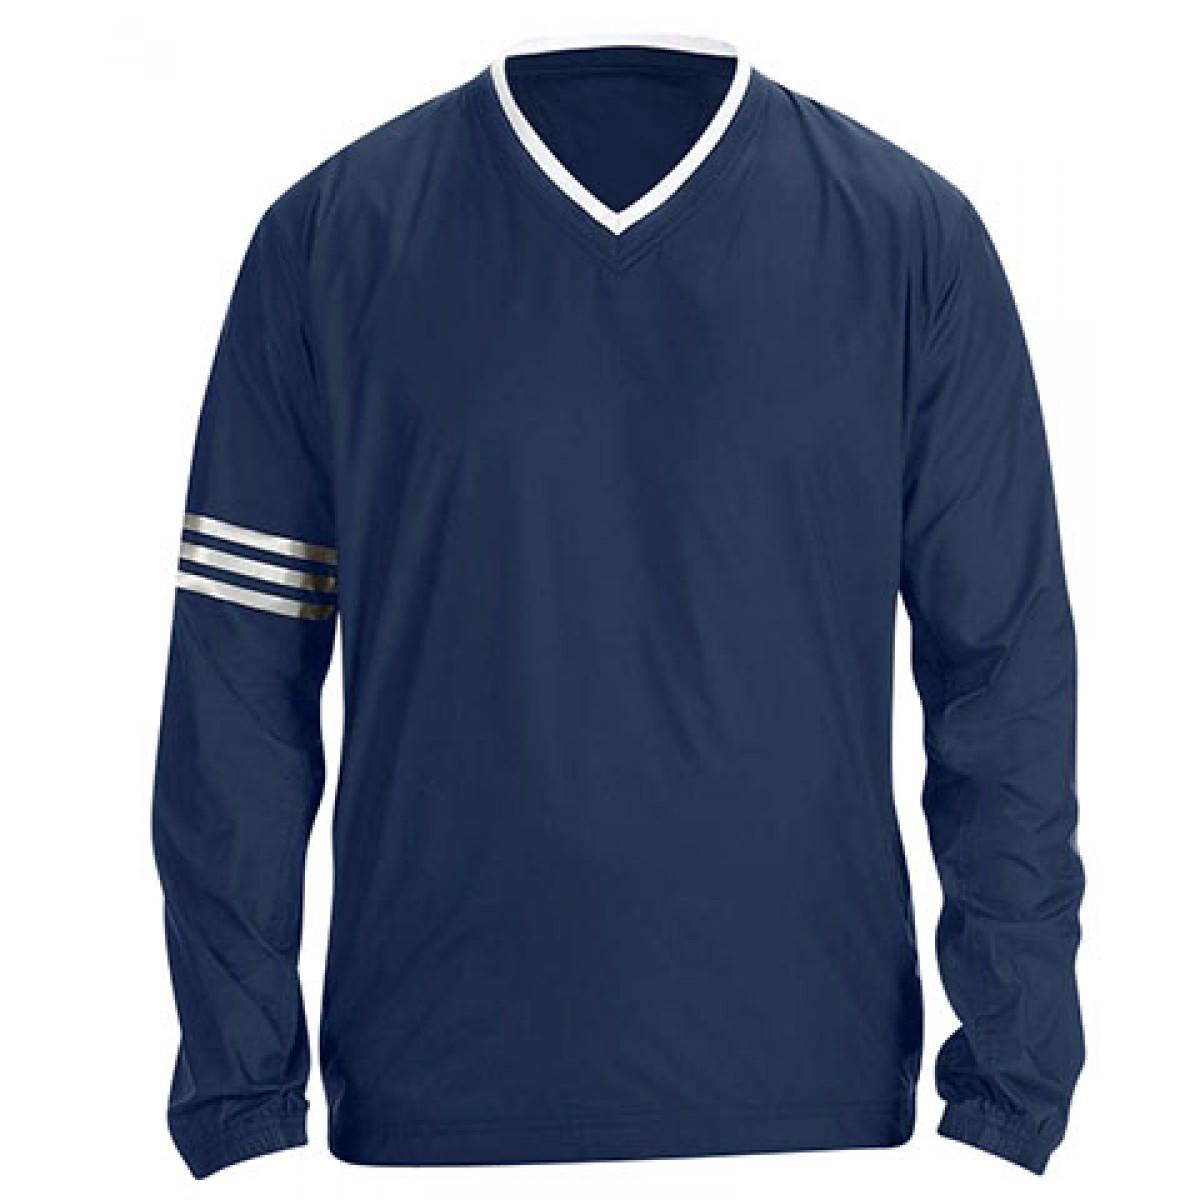 Adidas ClimaLite V-Neck Long Sleeve Wind Shirt-Navy-L